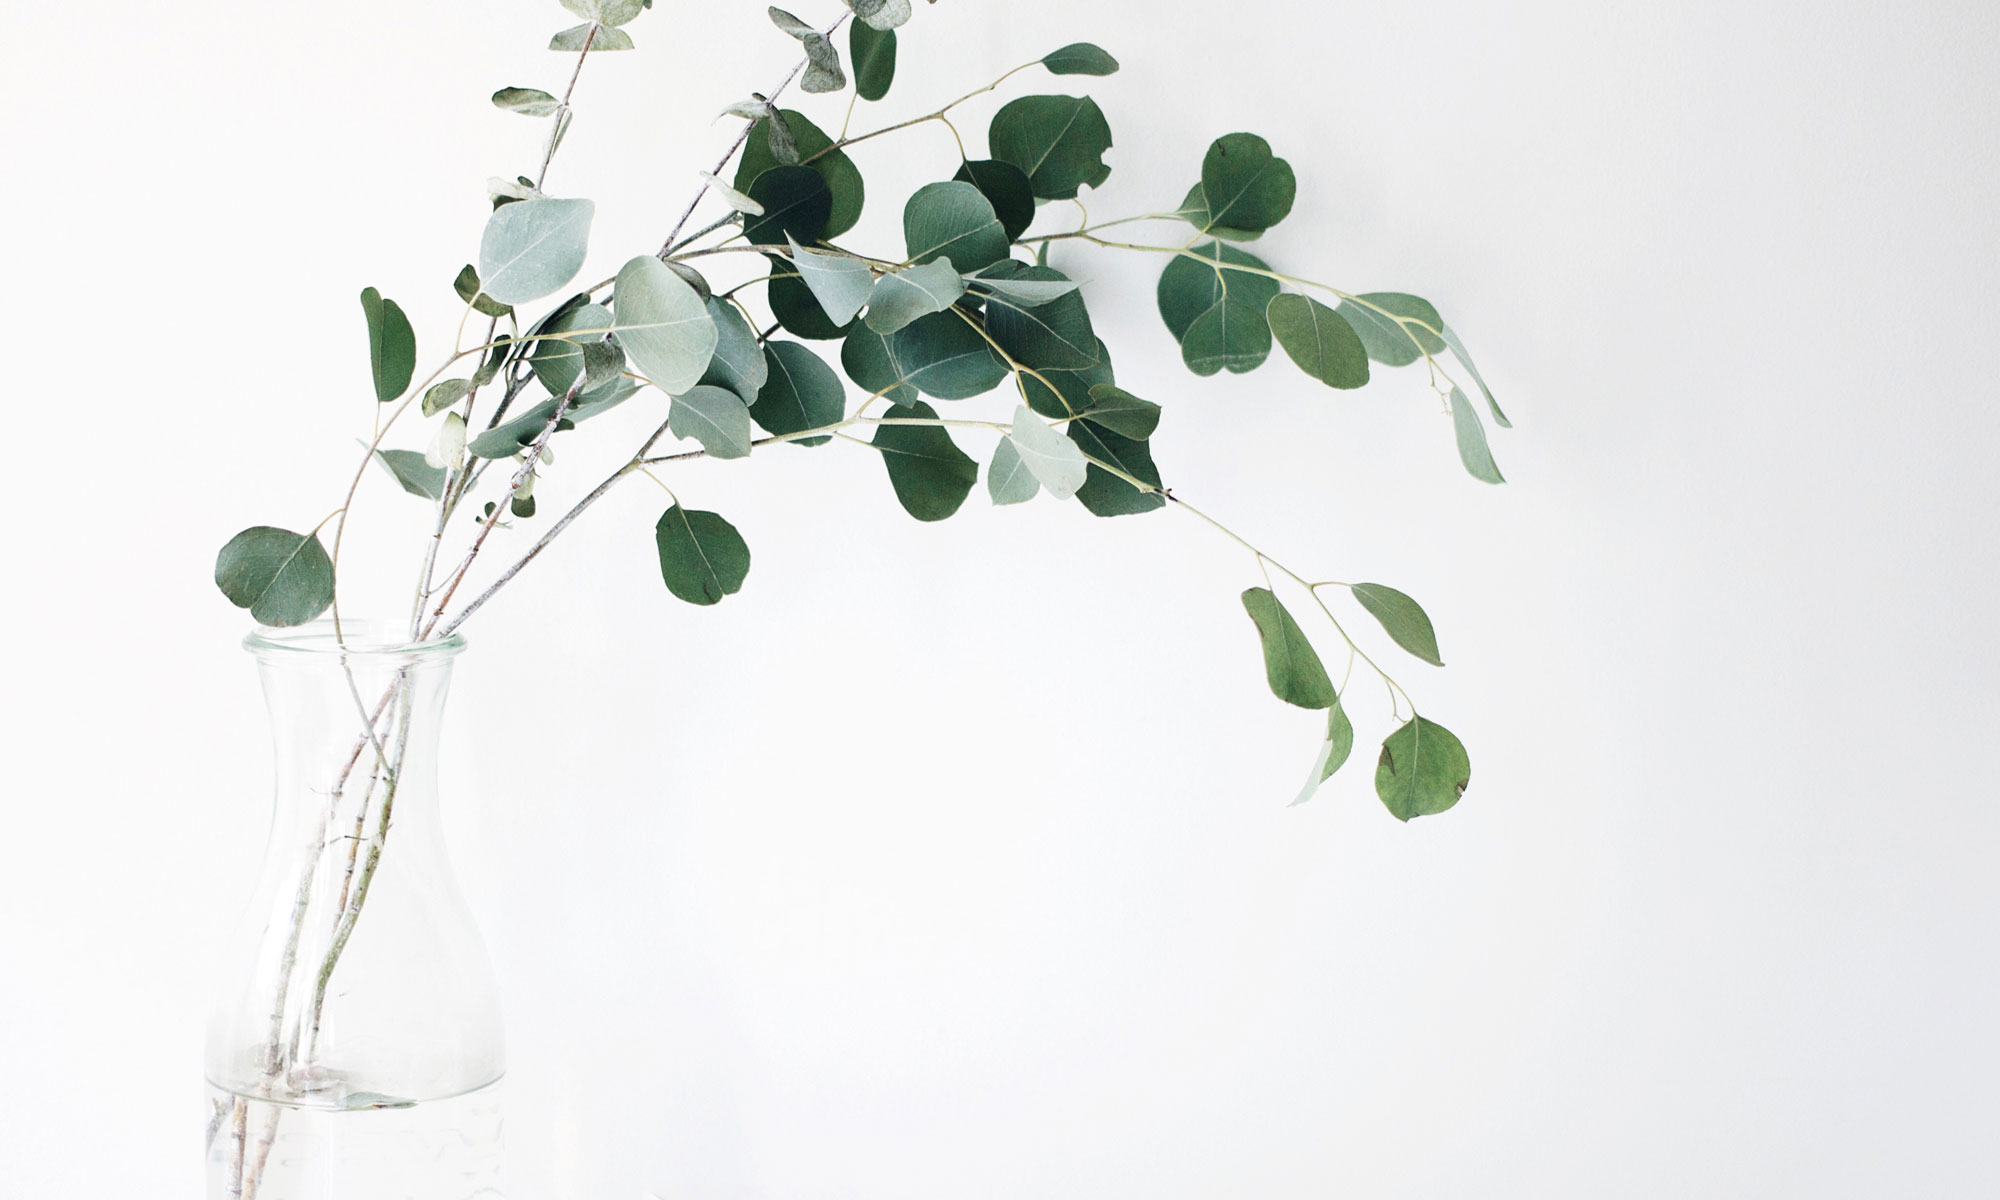 Eucalyptus stems in a glass jar